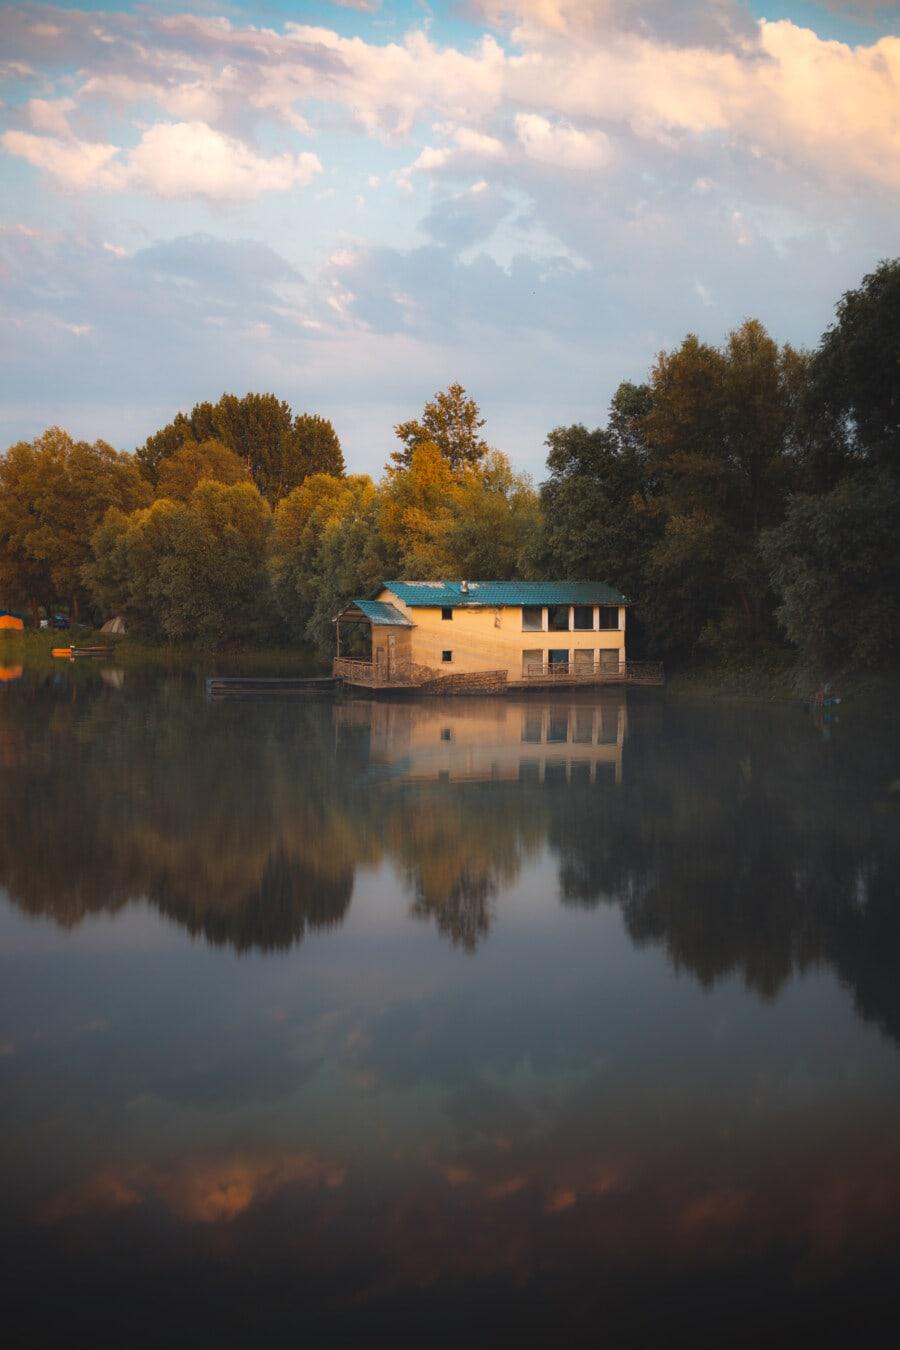 Ruhe, ruhig, Atmosphäre, verlassen, alt, Bootshaus, Verfall, Wasser, See, Sonnenuntergang